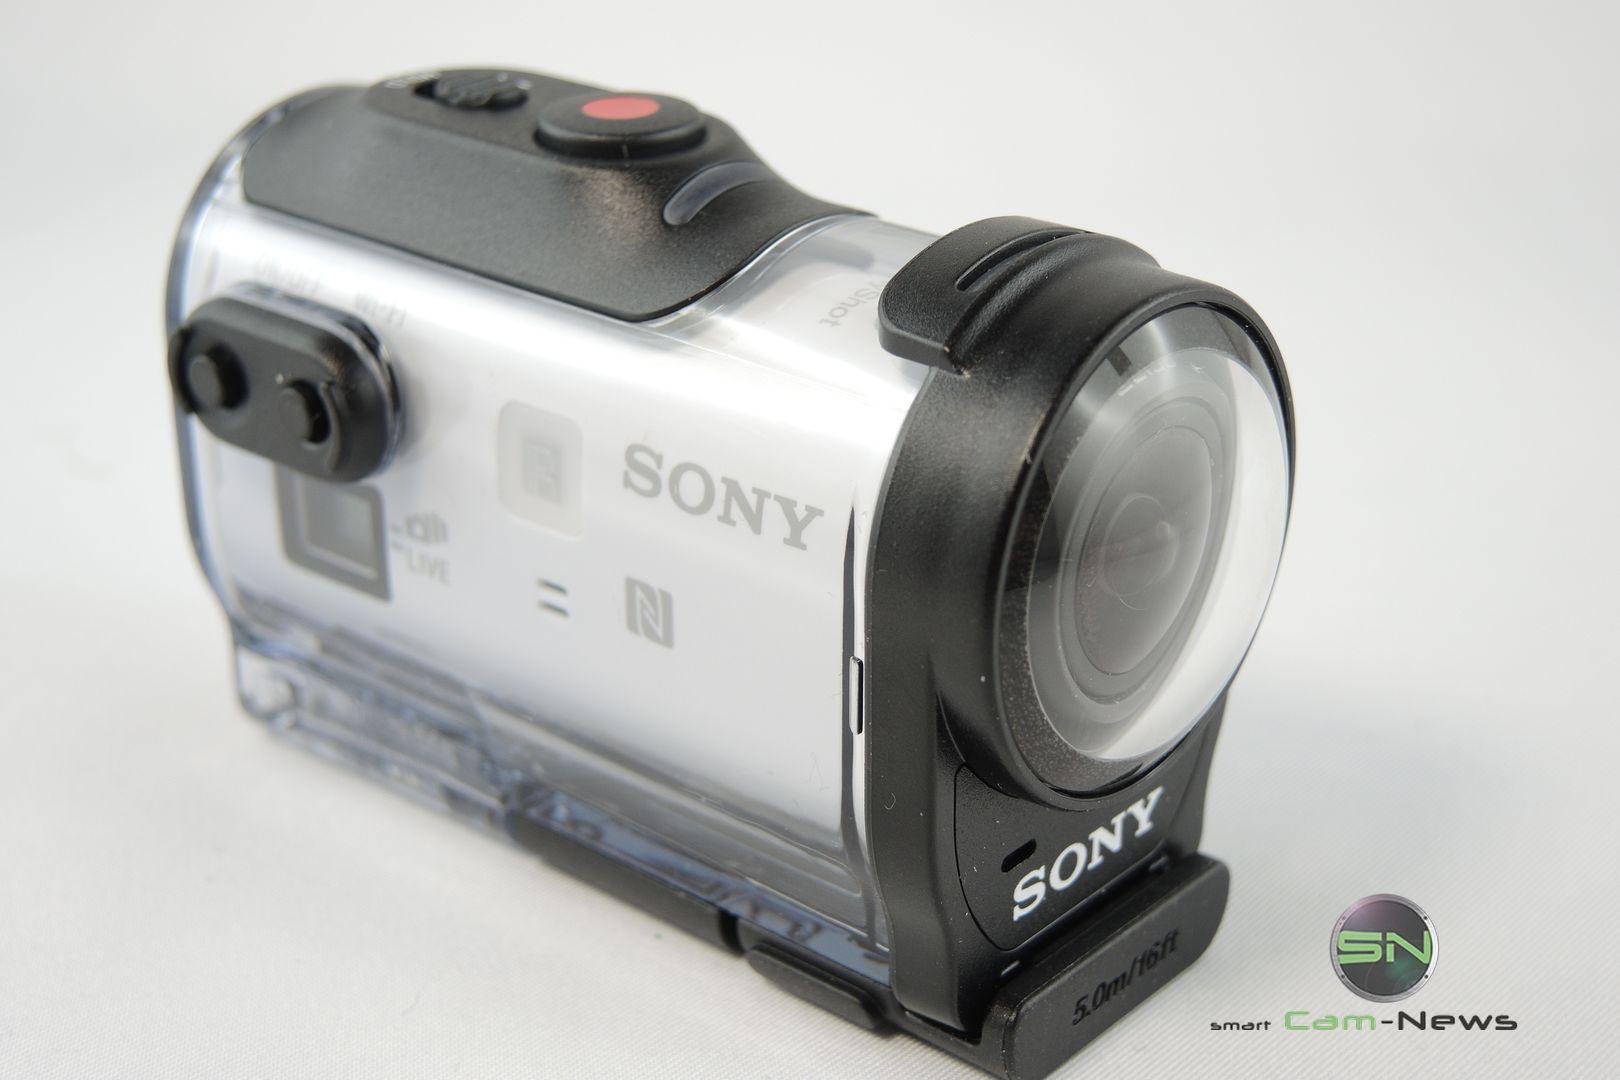 Sony ActionCam HDR AZ1 - Smart Cam News